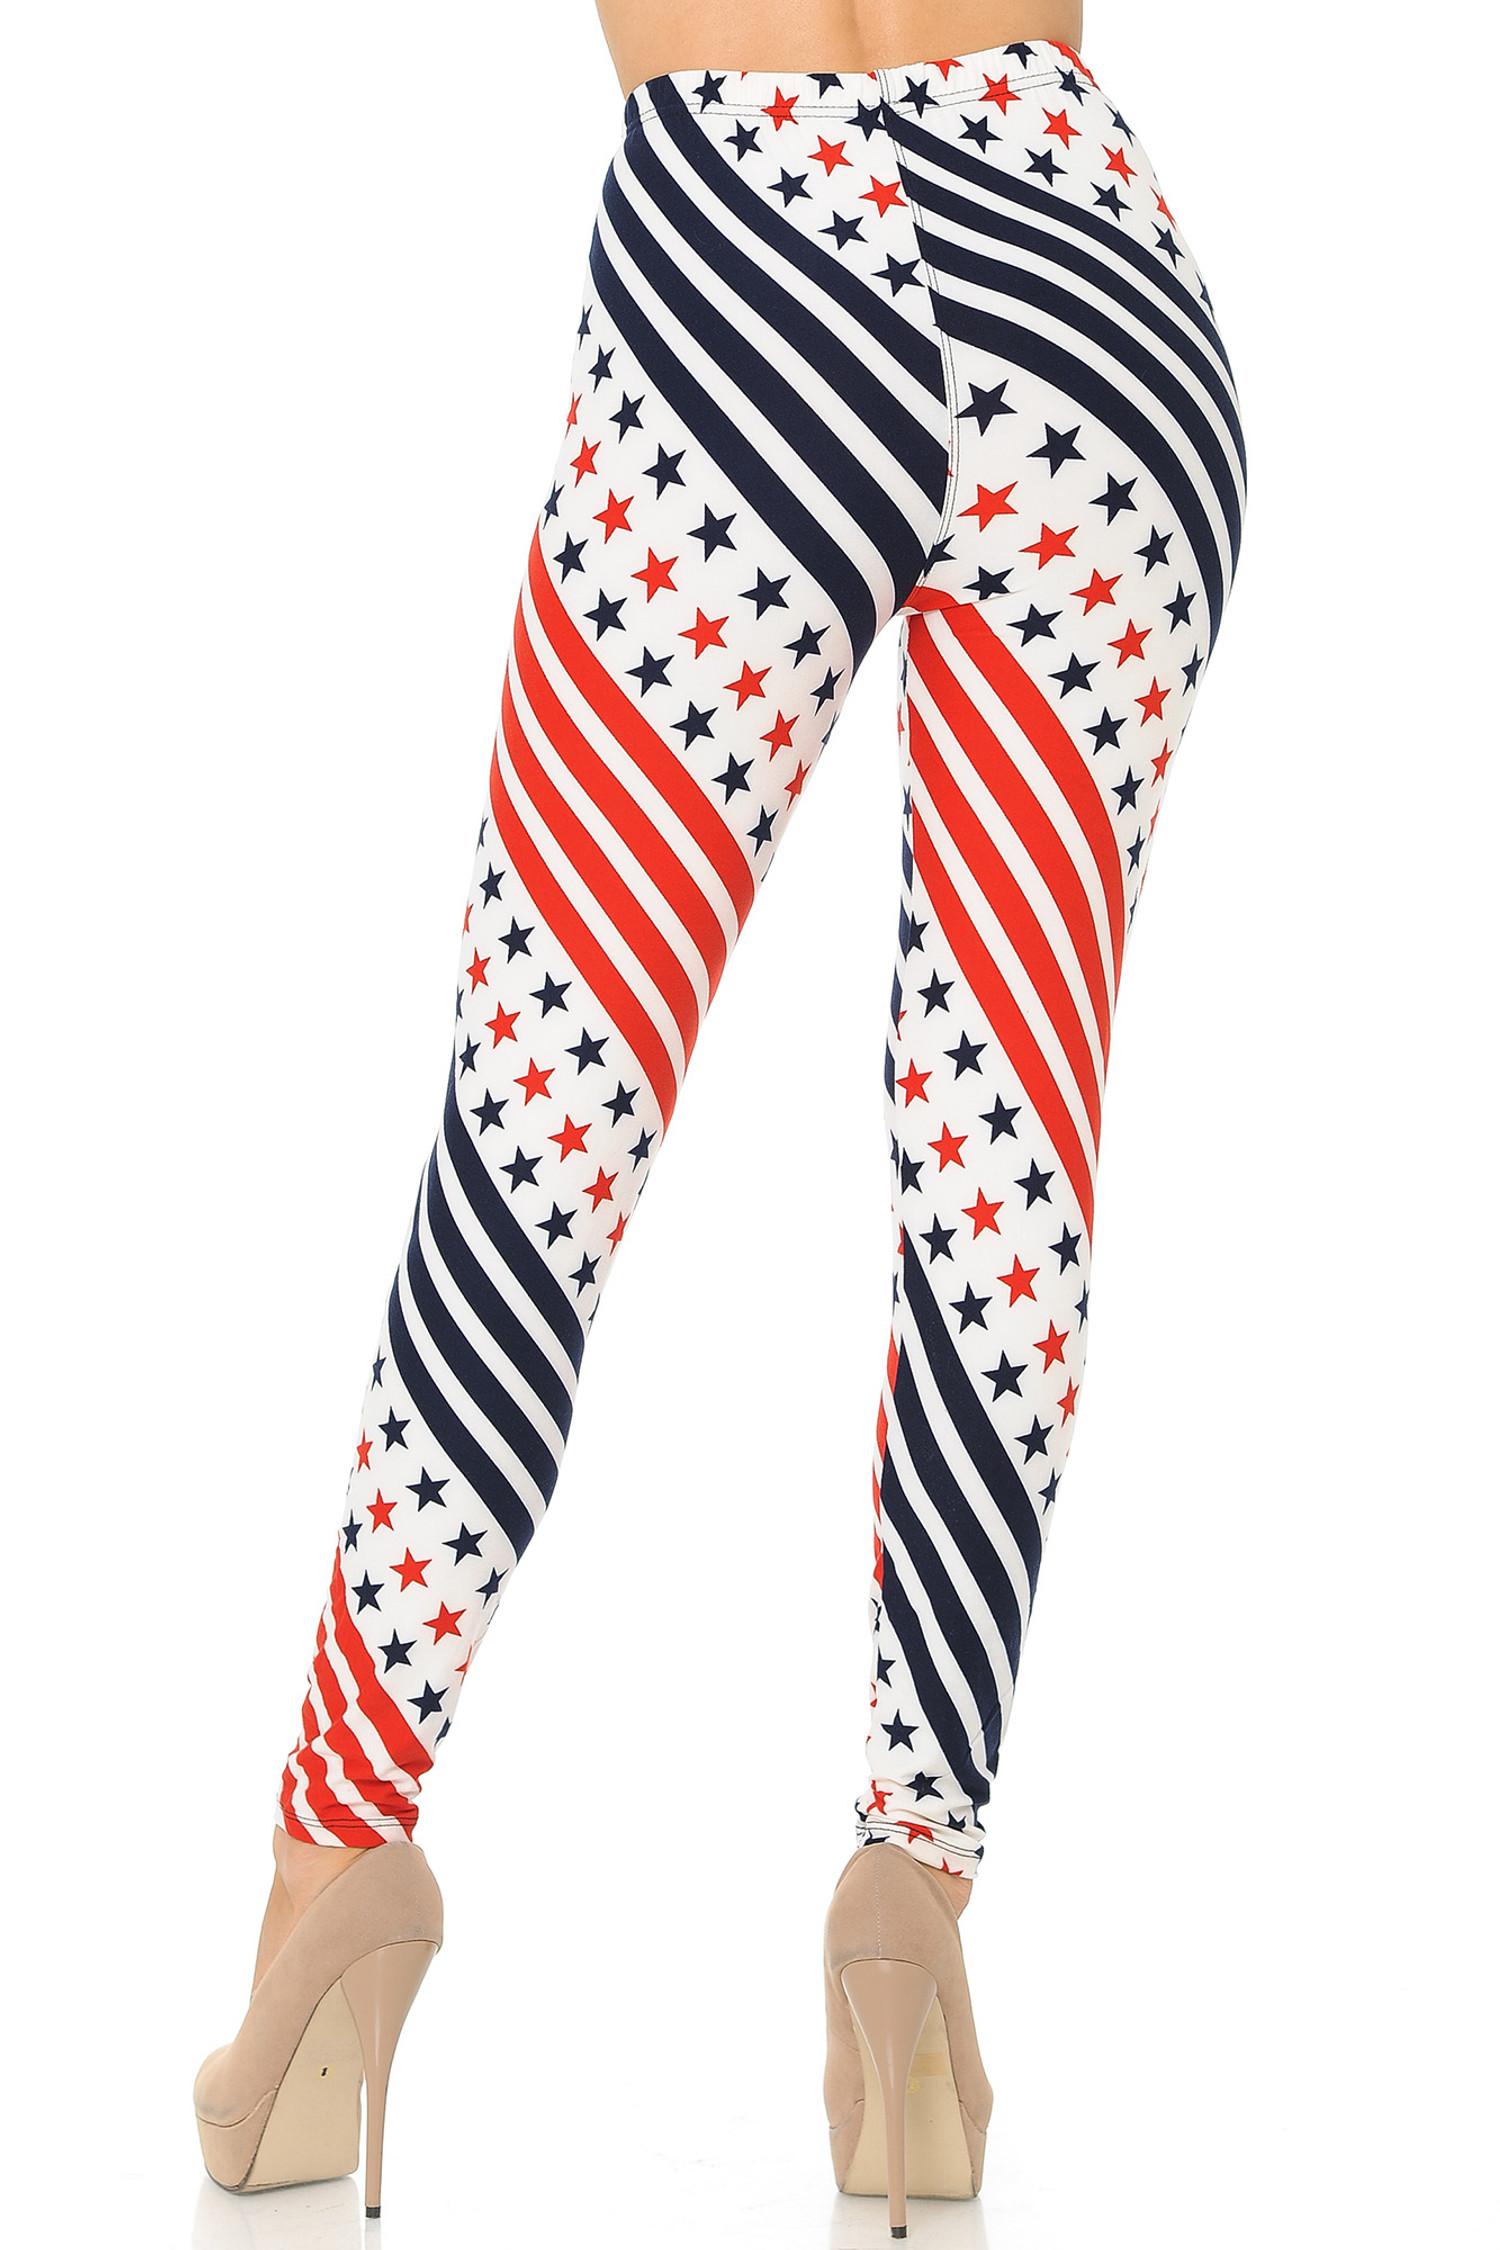 Brushed Twirling Stars and Stripes USA Flag Leggings